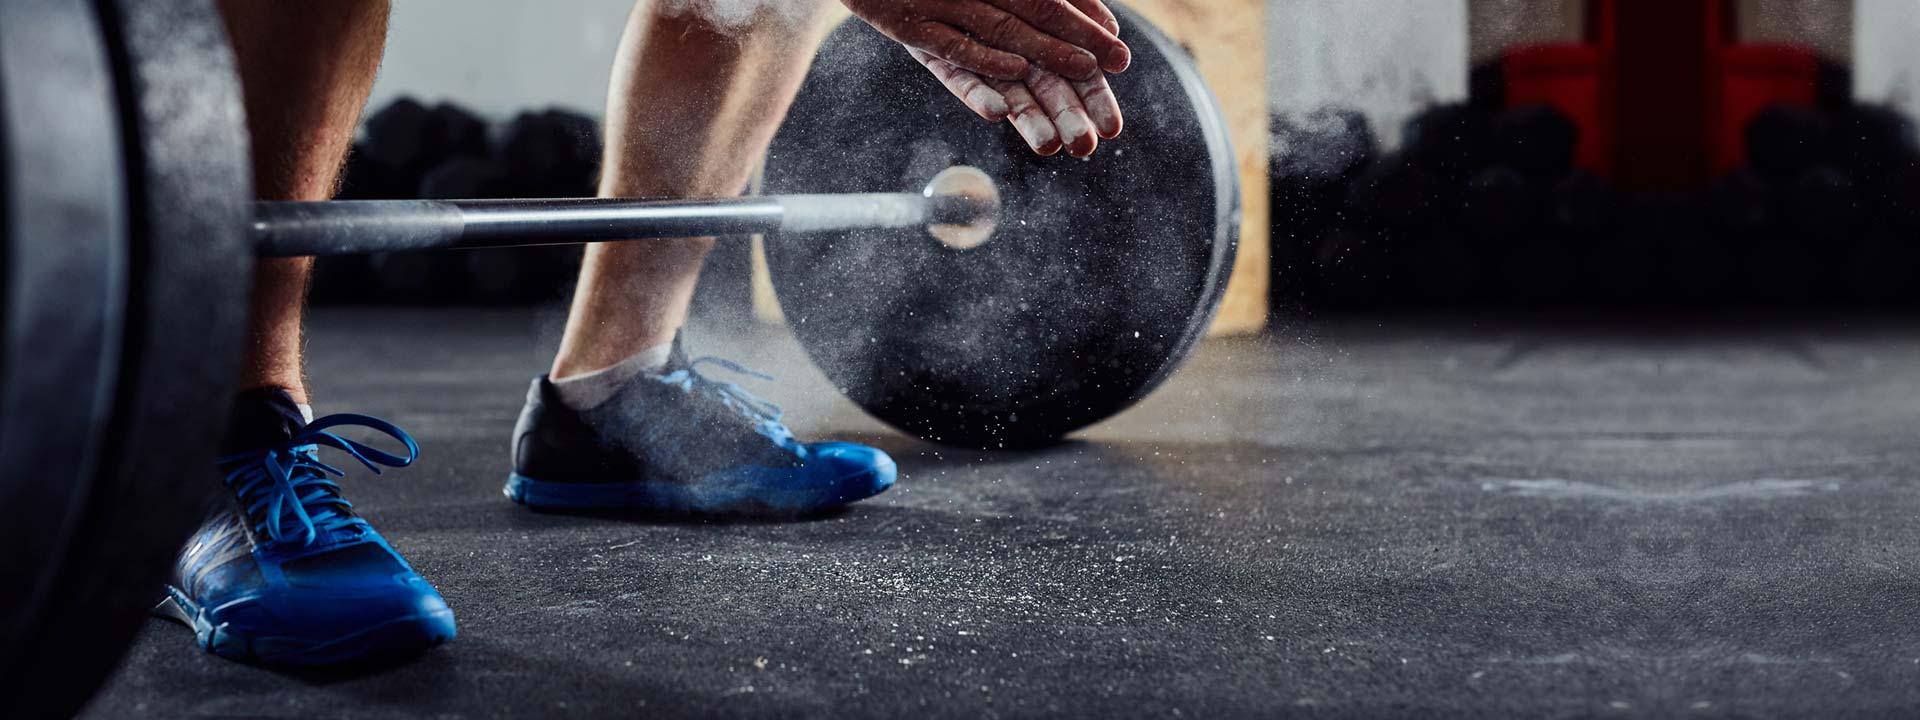 adidas samba weightlifting